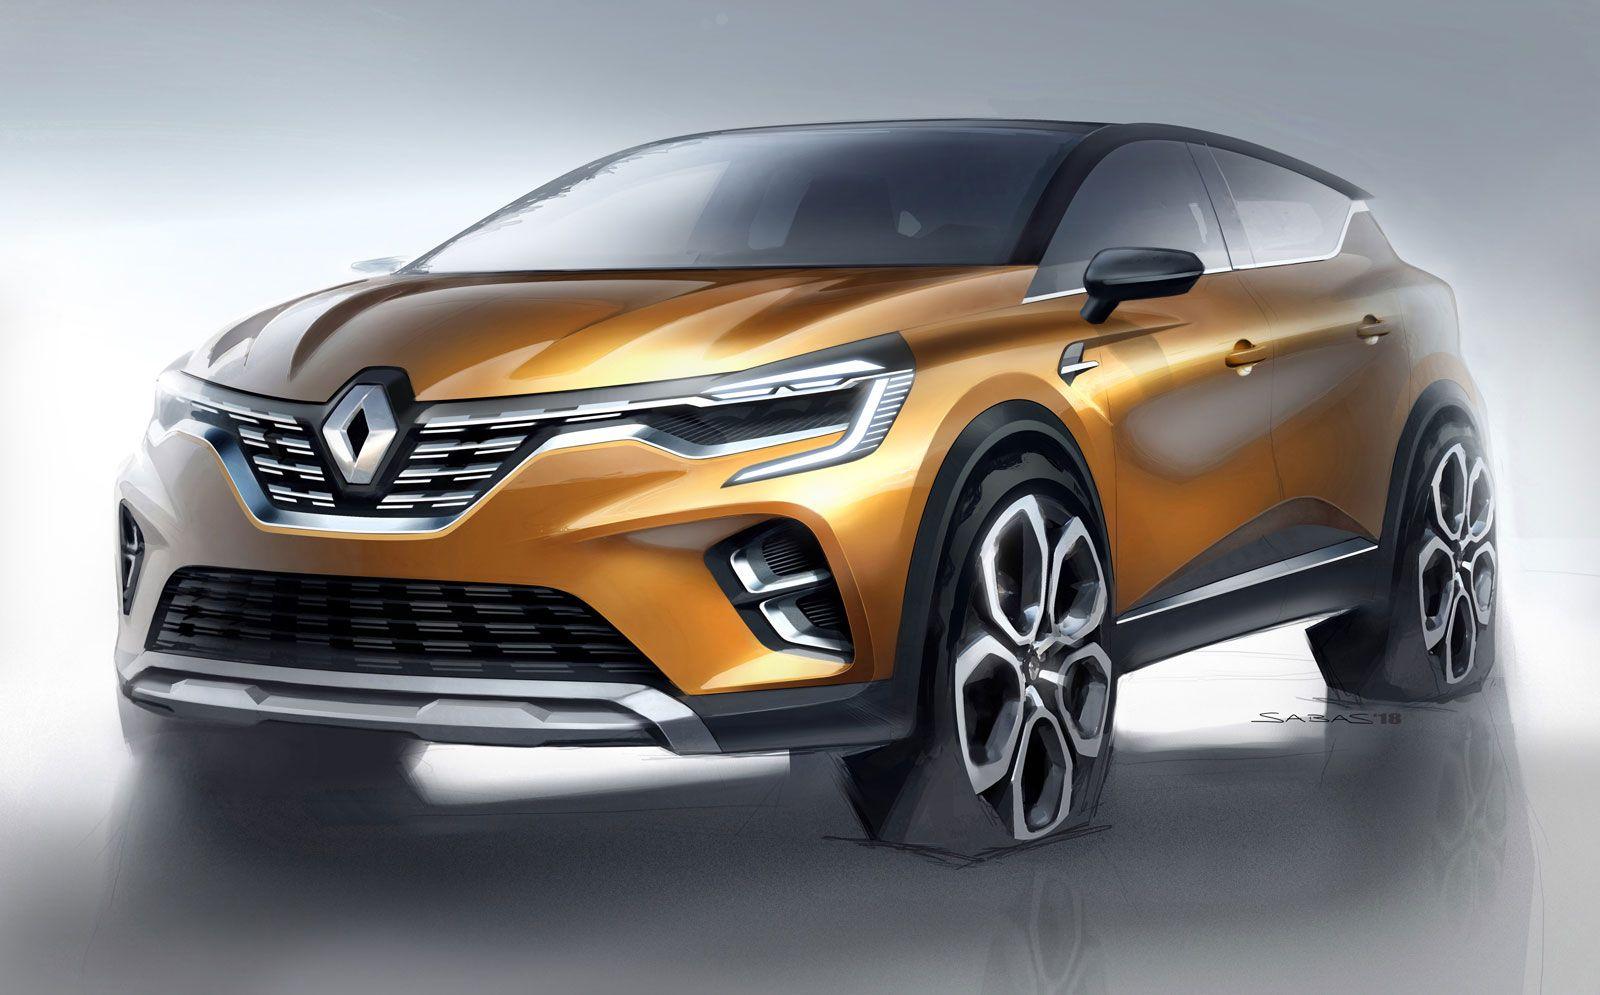 New Renault Captur Design Sketch Render Peugeot 2008 New